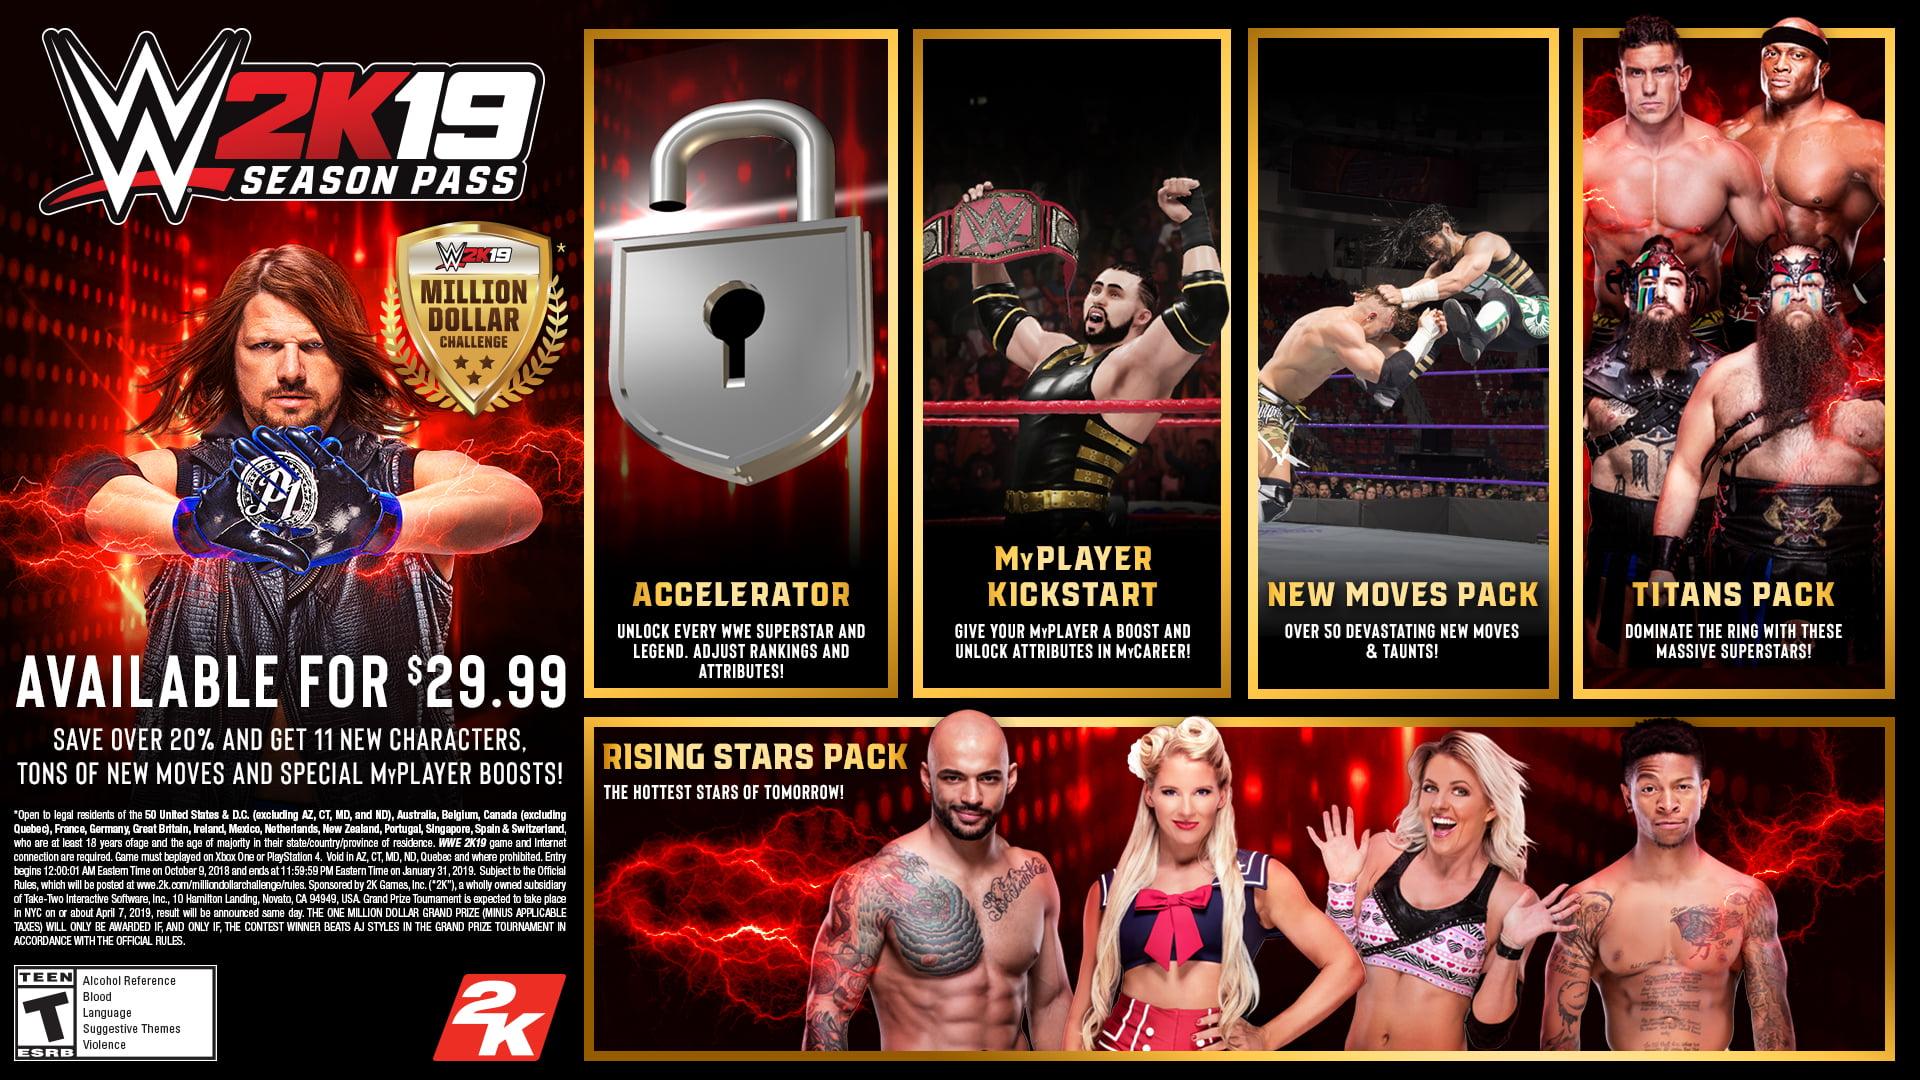 Wwe 2k19 Deluxe Edition 2k Playstation 4 710425570728 Walmart Com Walmart Com